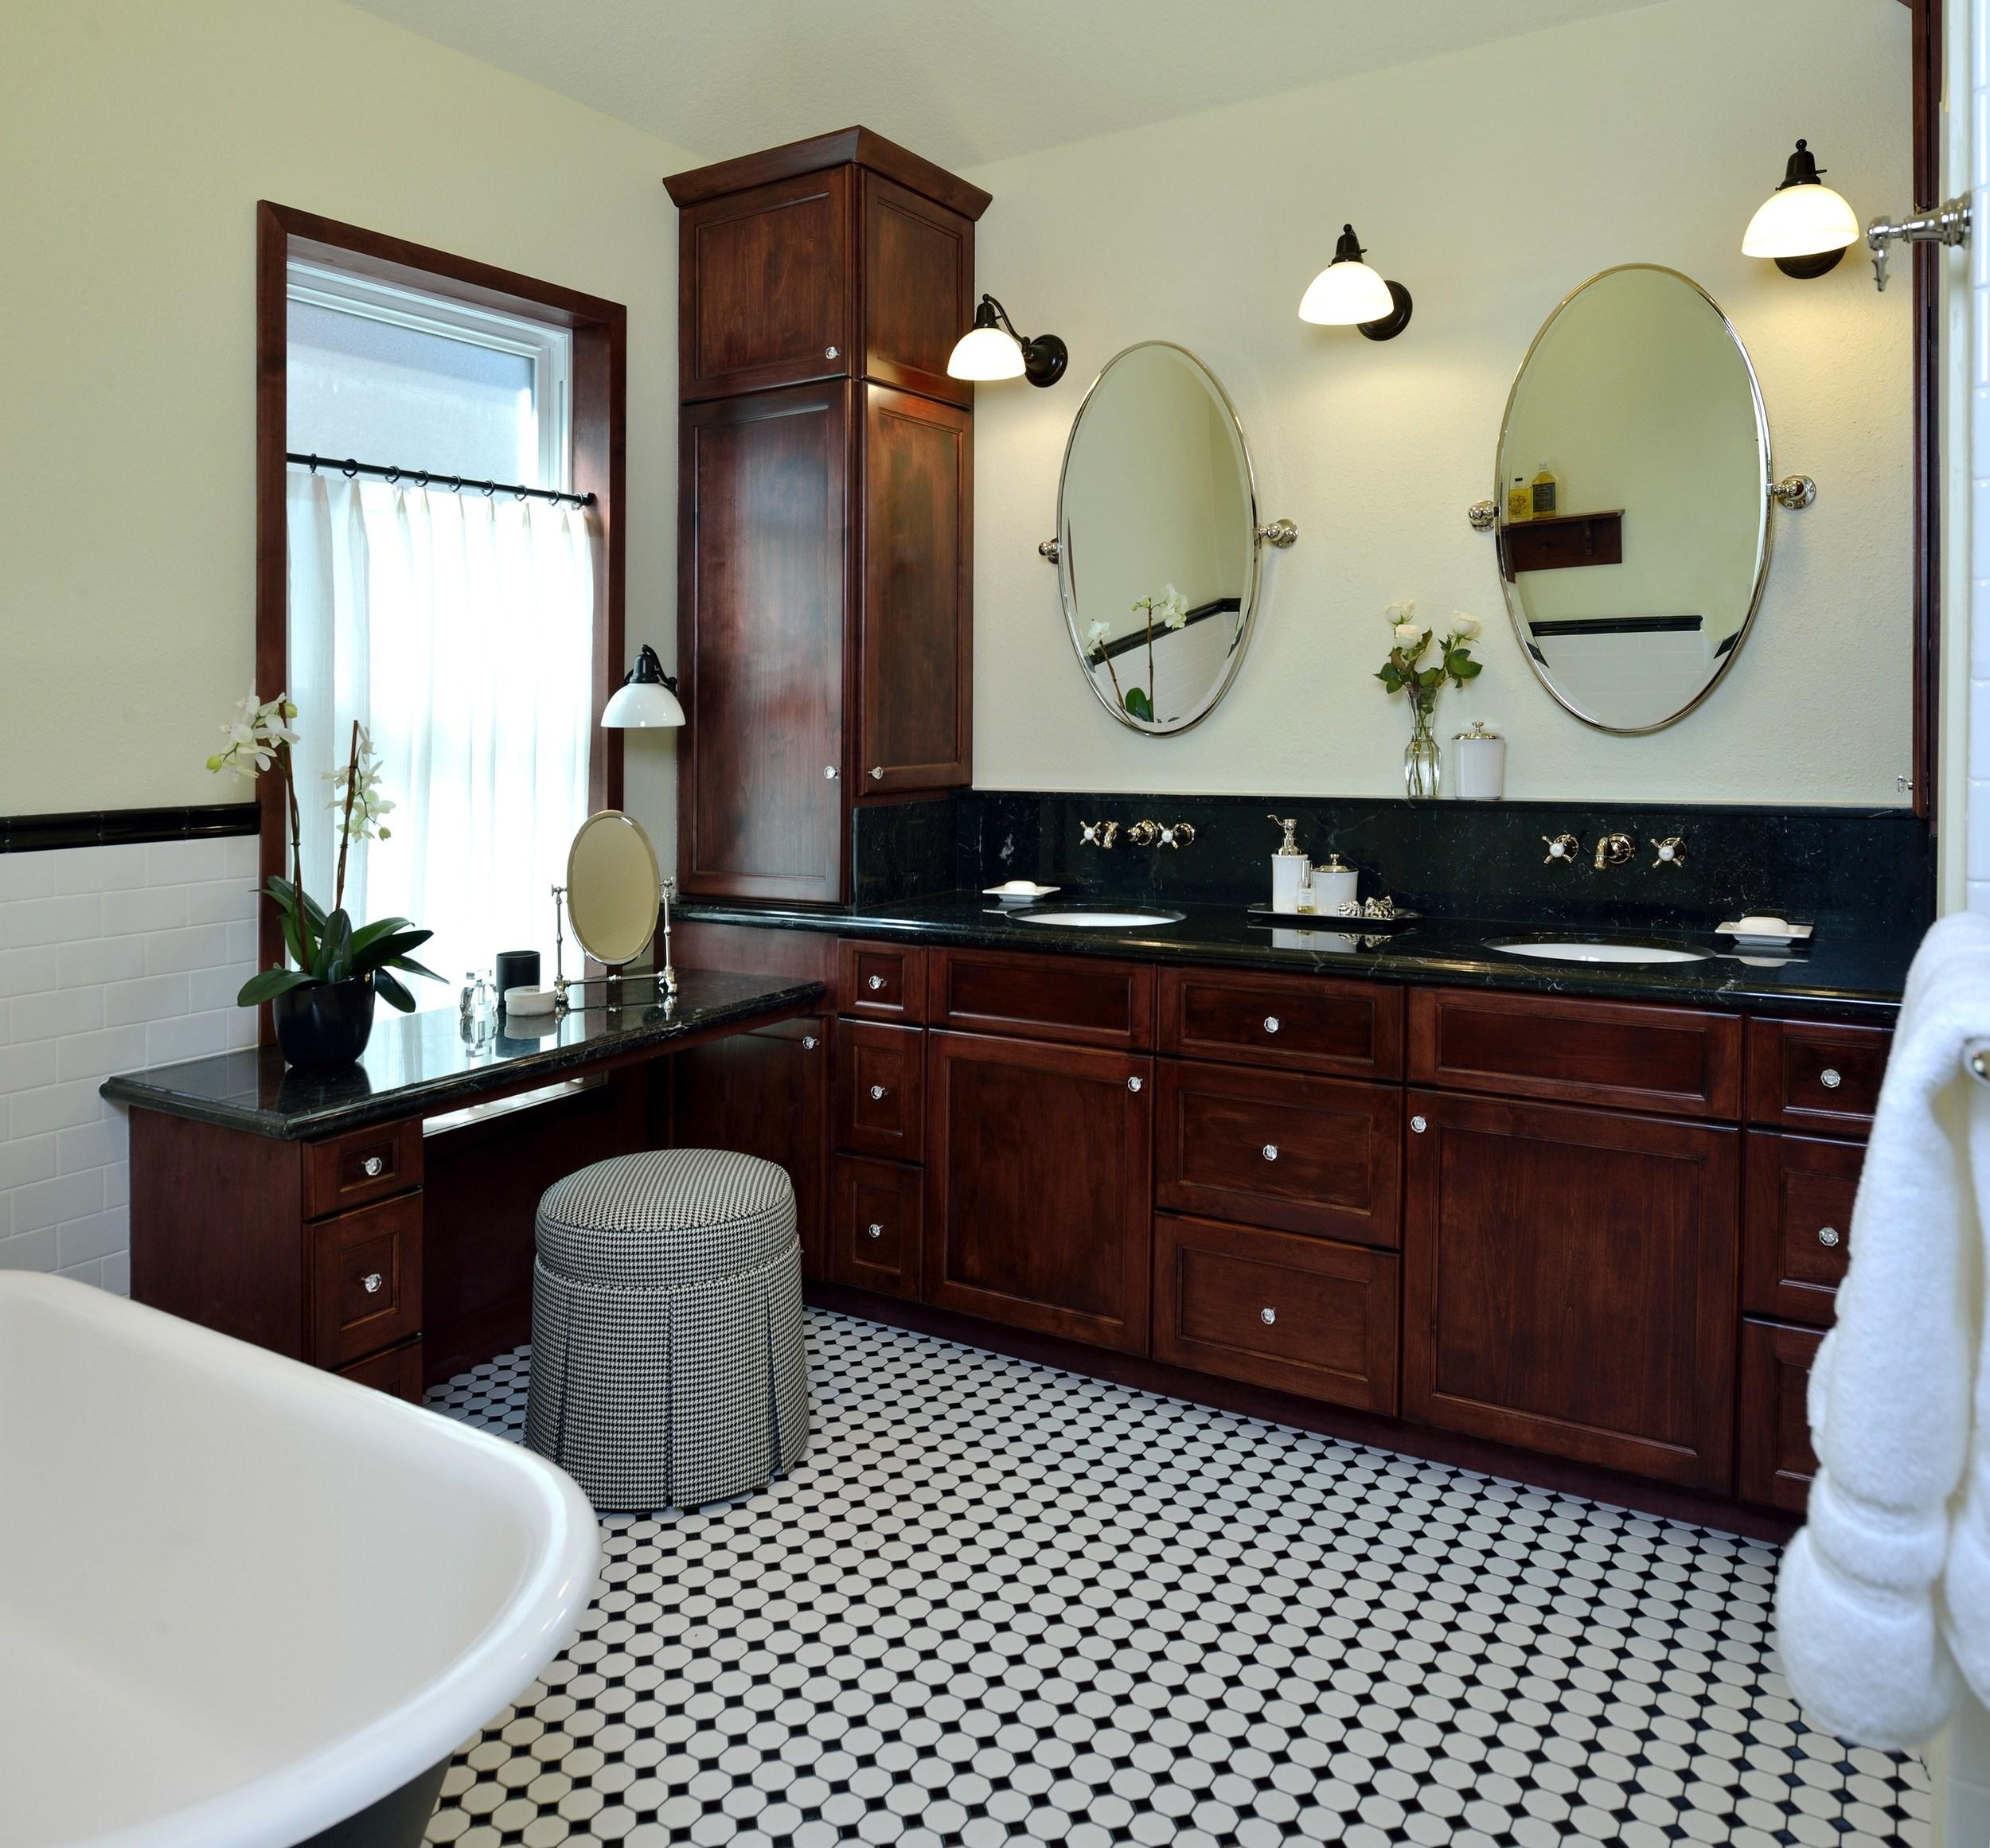 Bathroom remodel with vintage style black and white tile floor and make up vanity, Designer: Carla Aston